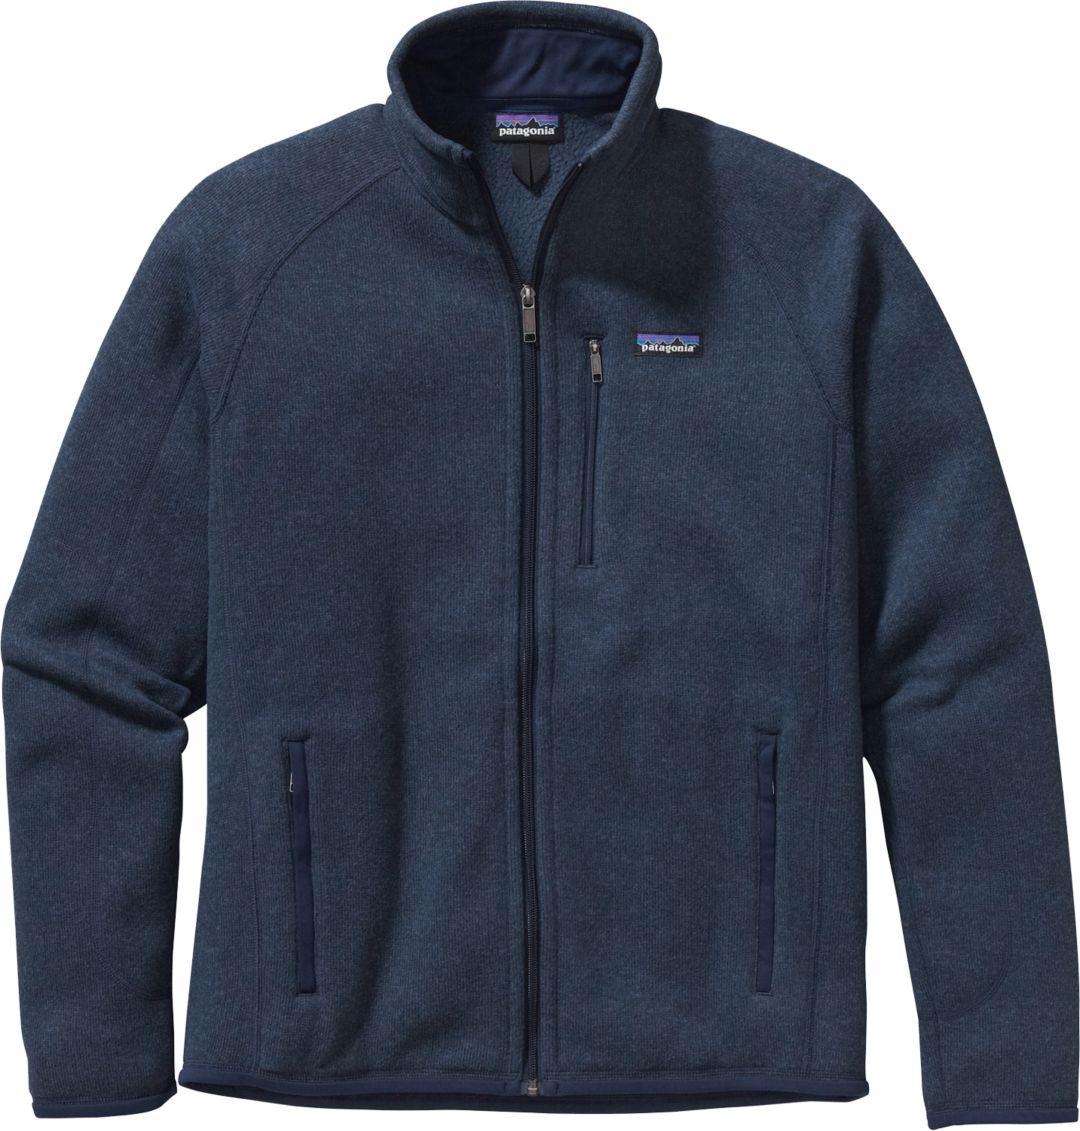 ce1747b8c0f Patagonia Men s Better Sweater Fleece Jacket 1